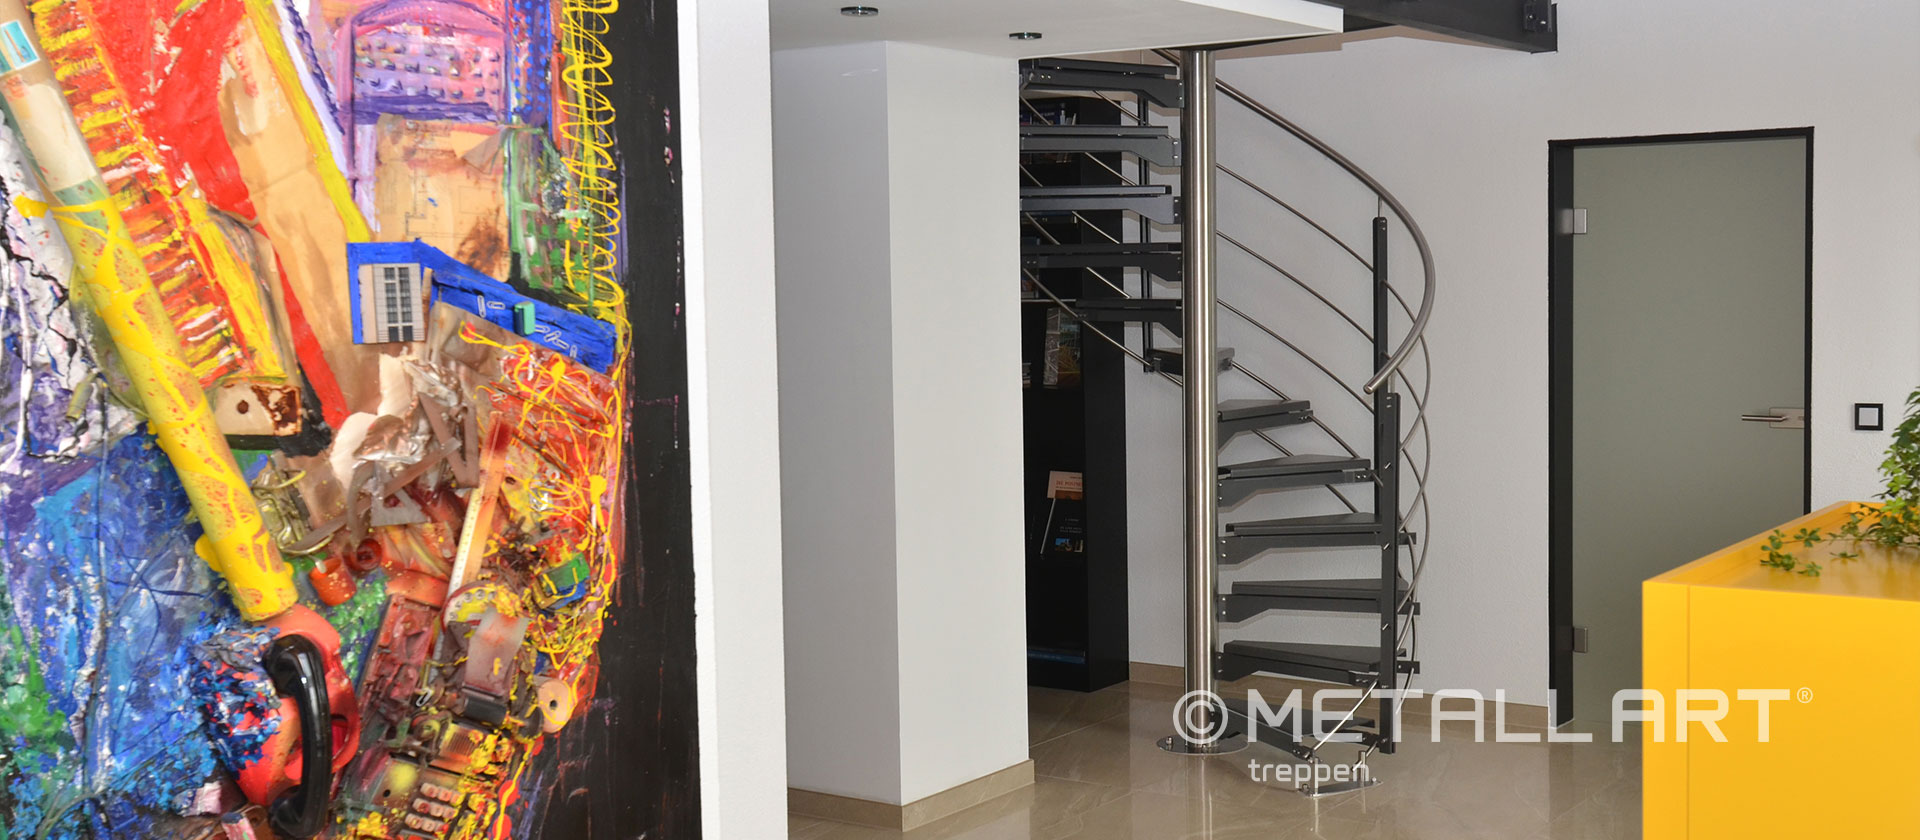 Treppe im Büro gespindelt